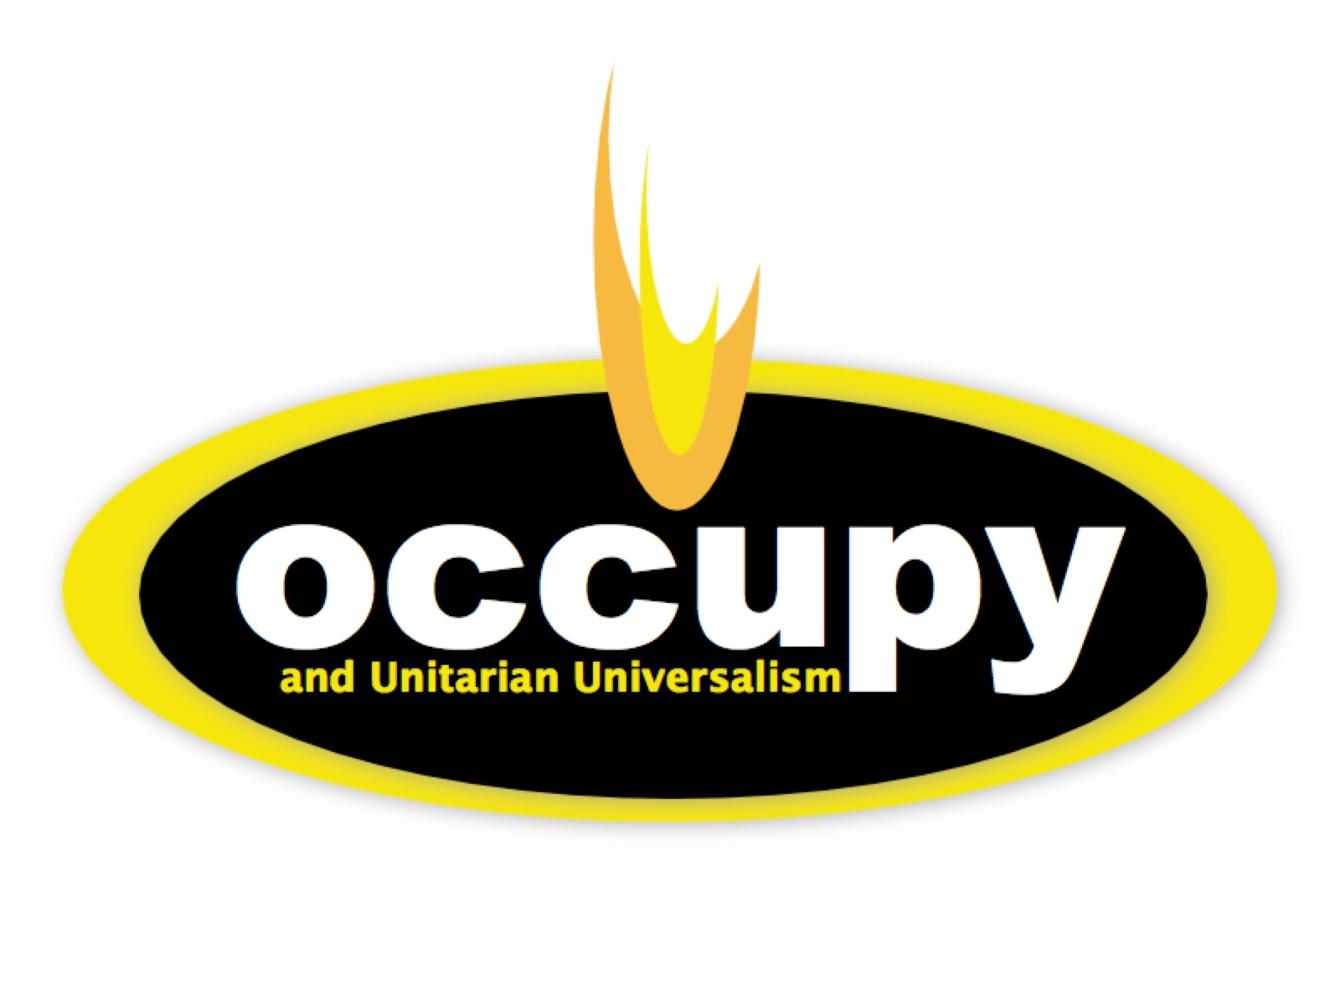 Occupy and Unitarian Universalism